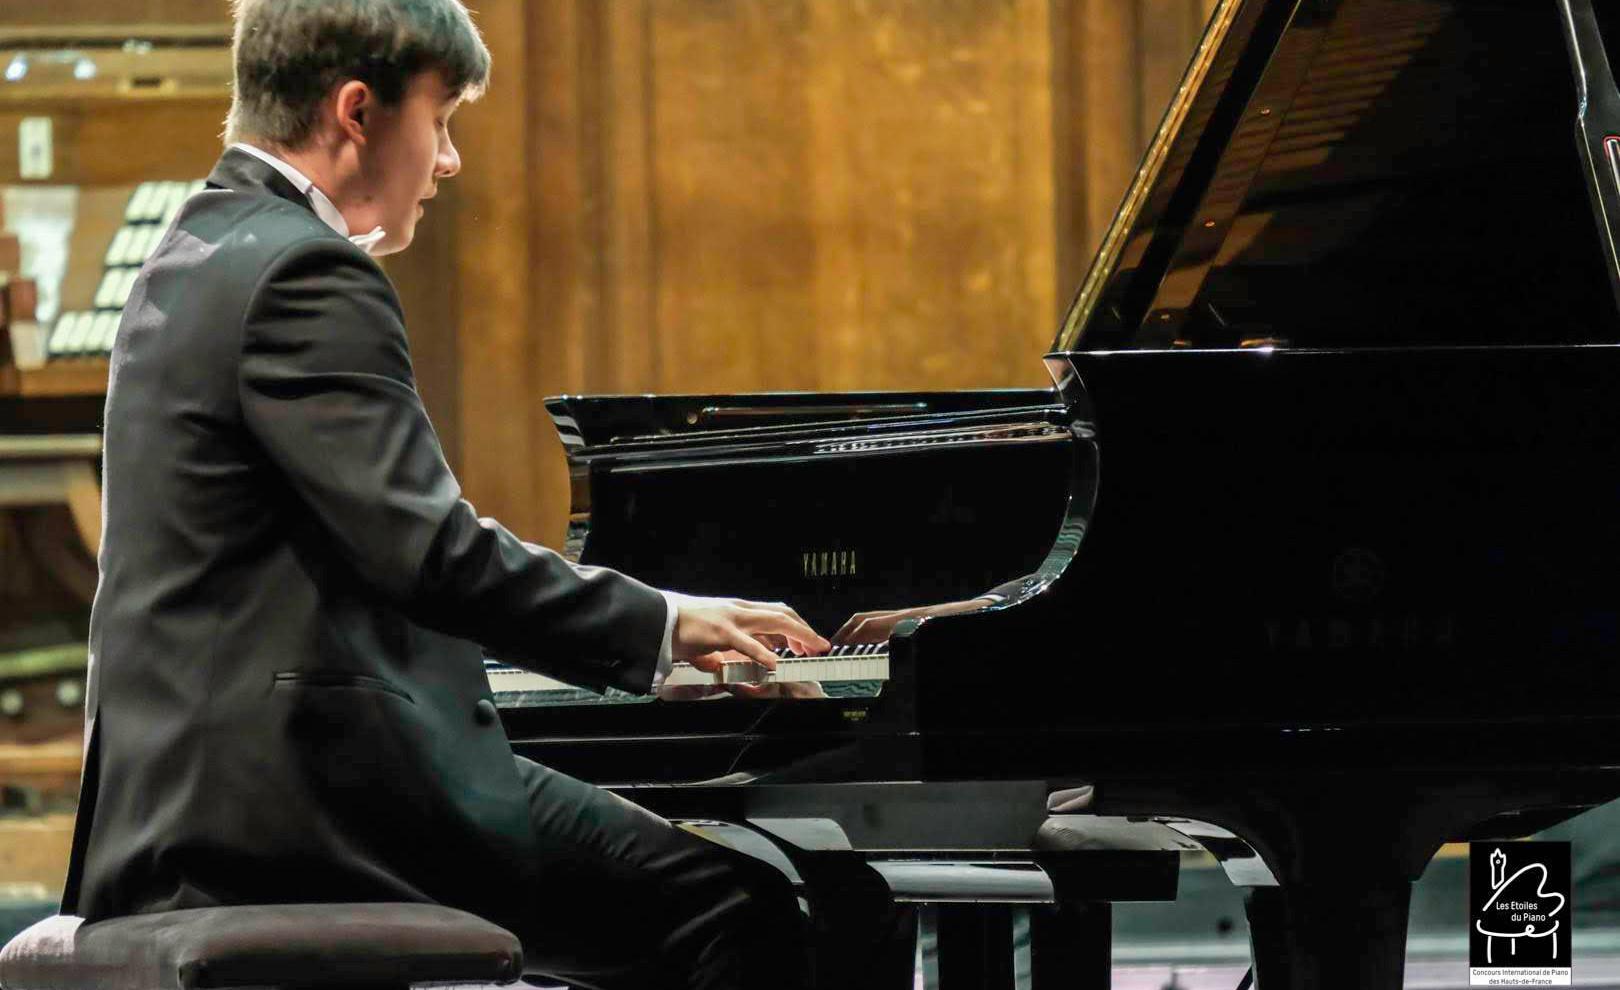 Tagir Kamaltdinov (Russie) 3ème prix des Etoiles du piano en 2019, en audition